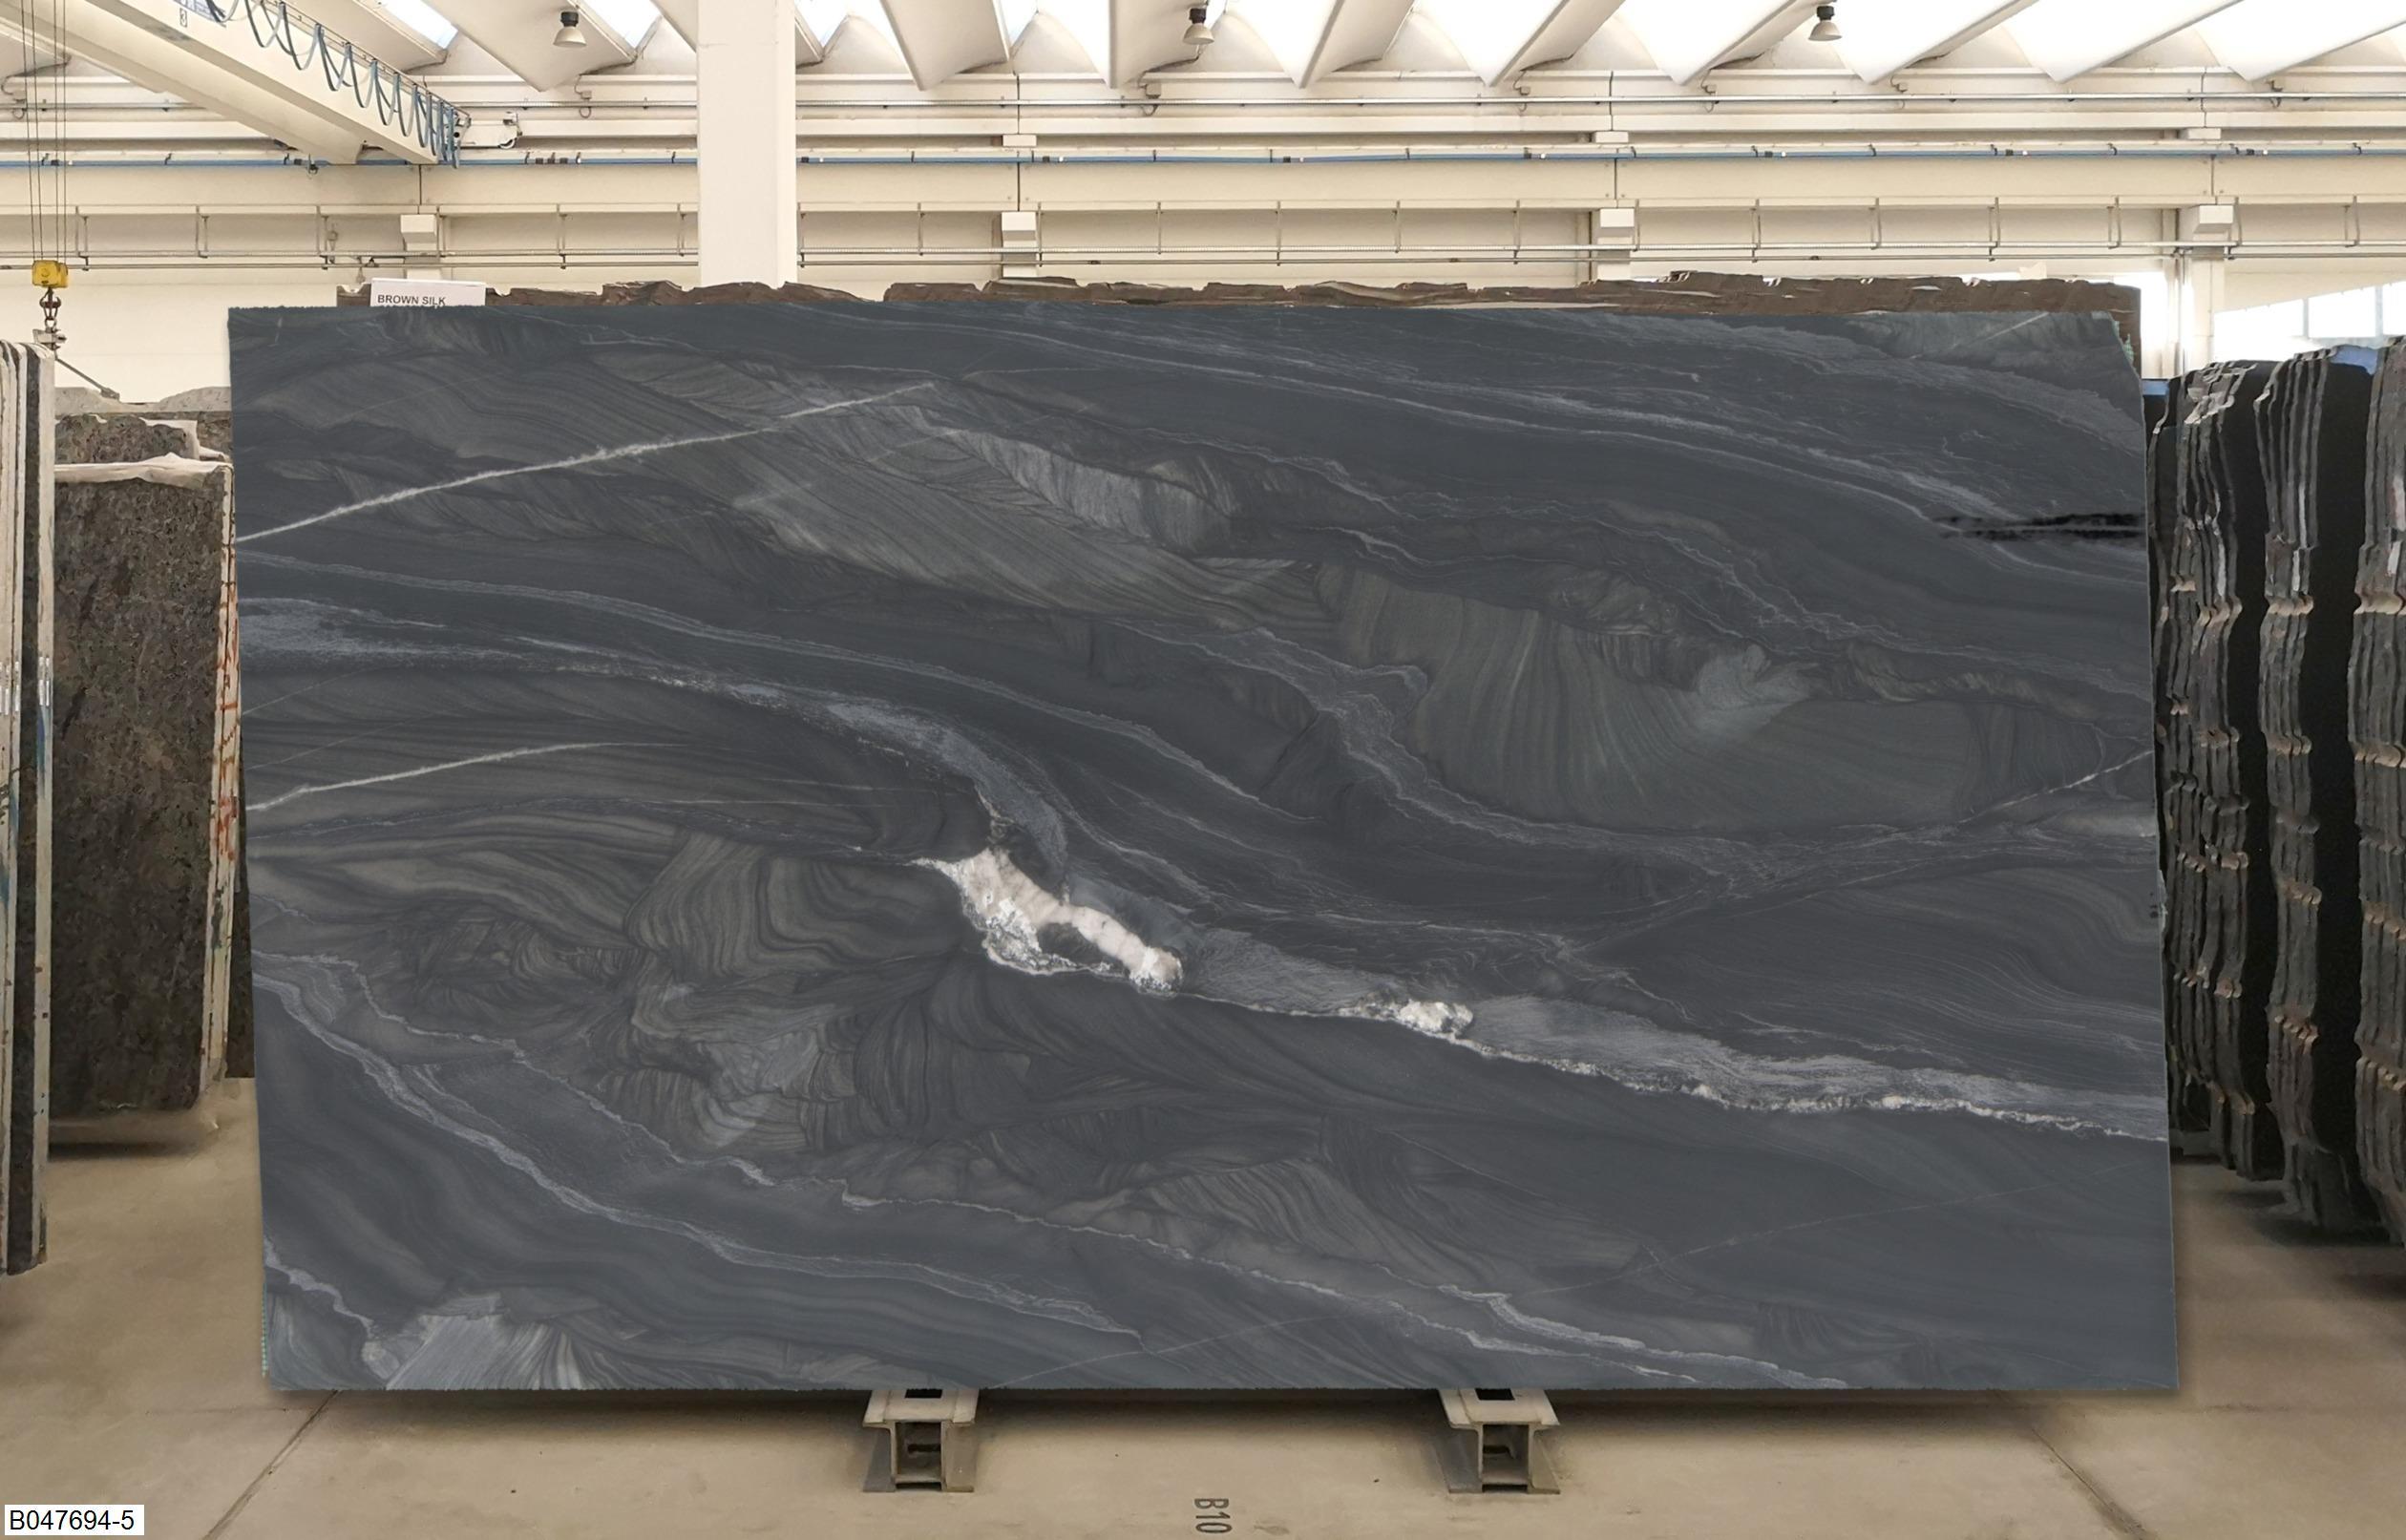 BLACK TEMPEST - LASTRE SATINATE-MACCHIA APERTA Foto: 1_59697_39240.jpg